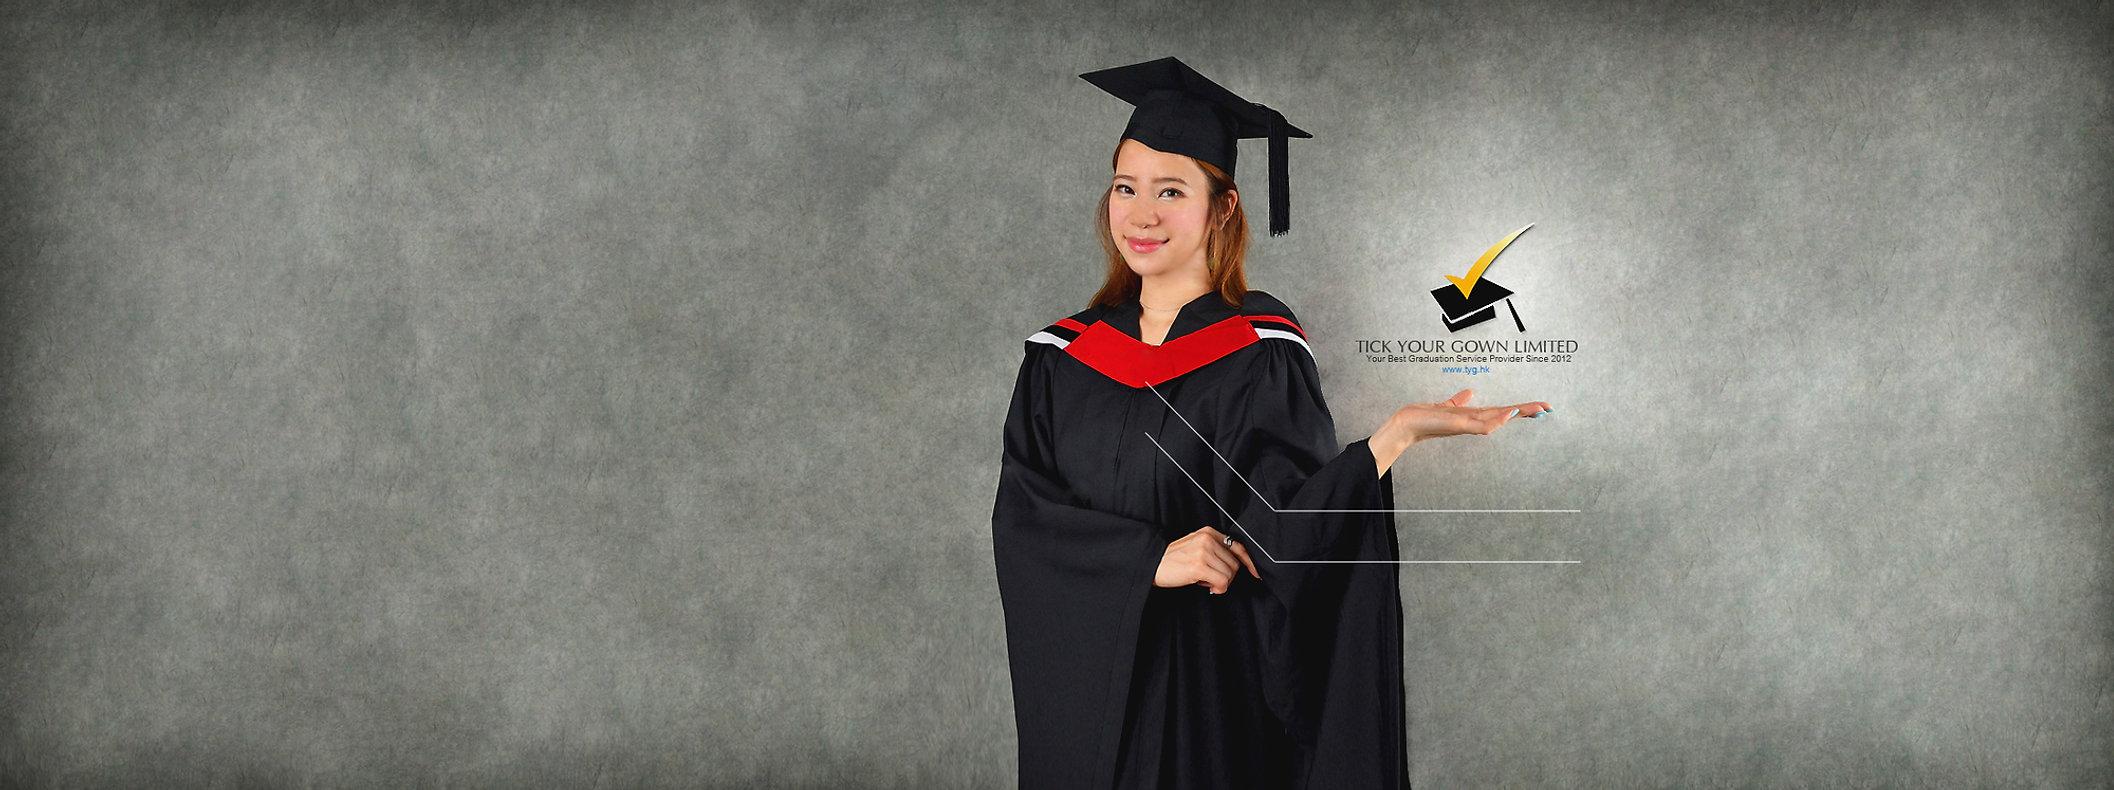 826a5e900d0 Graduation Gown  Graduation Gown Hong Kong  Graduation Gown Rental Purchase  Buy  畢業袍